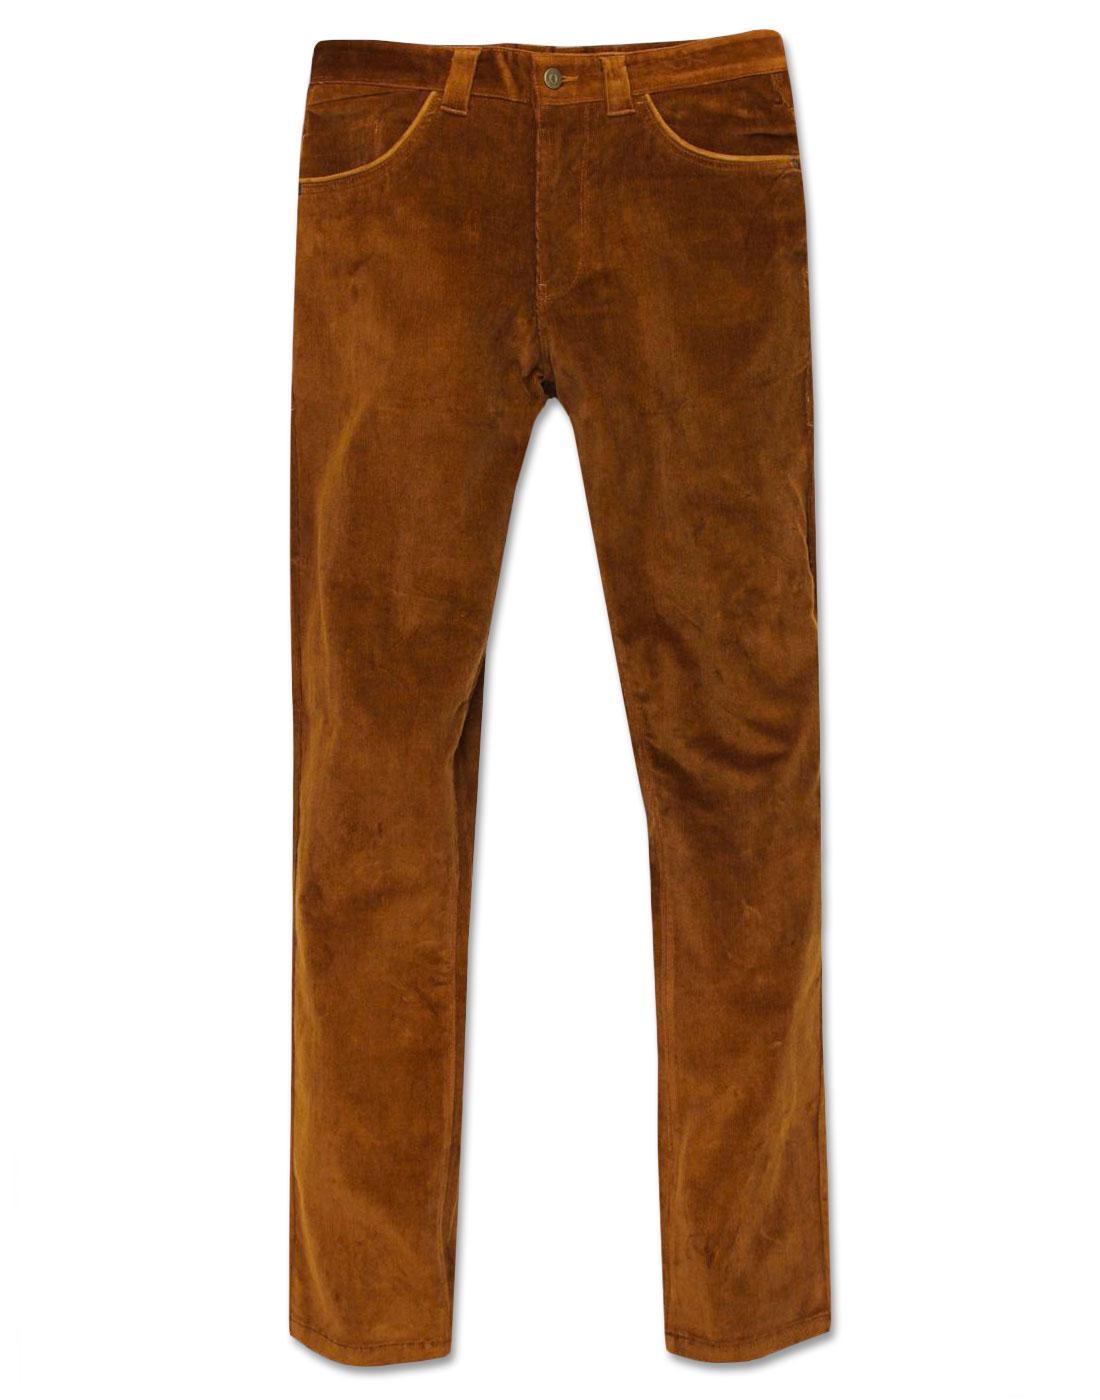 Robson GABICCI VINTAGE Mod Slim Cord Trousers TAN